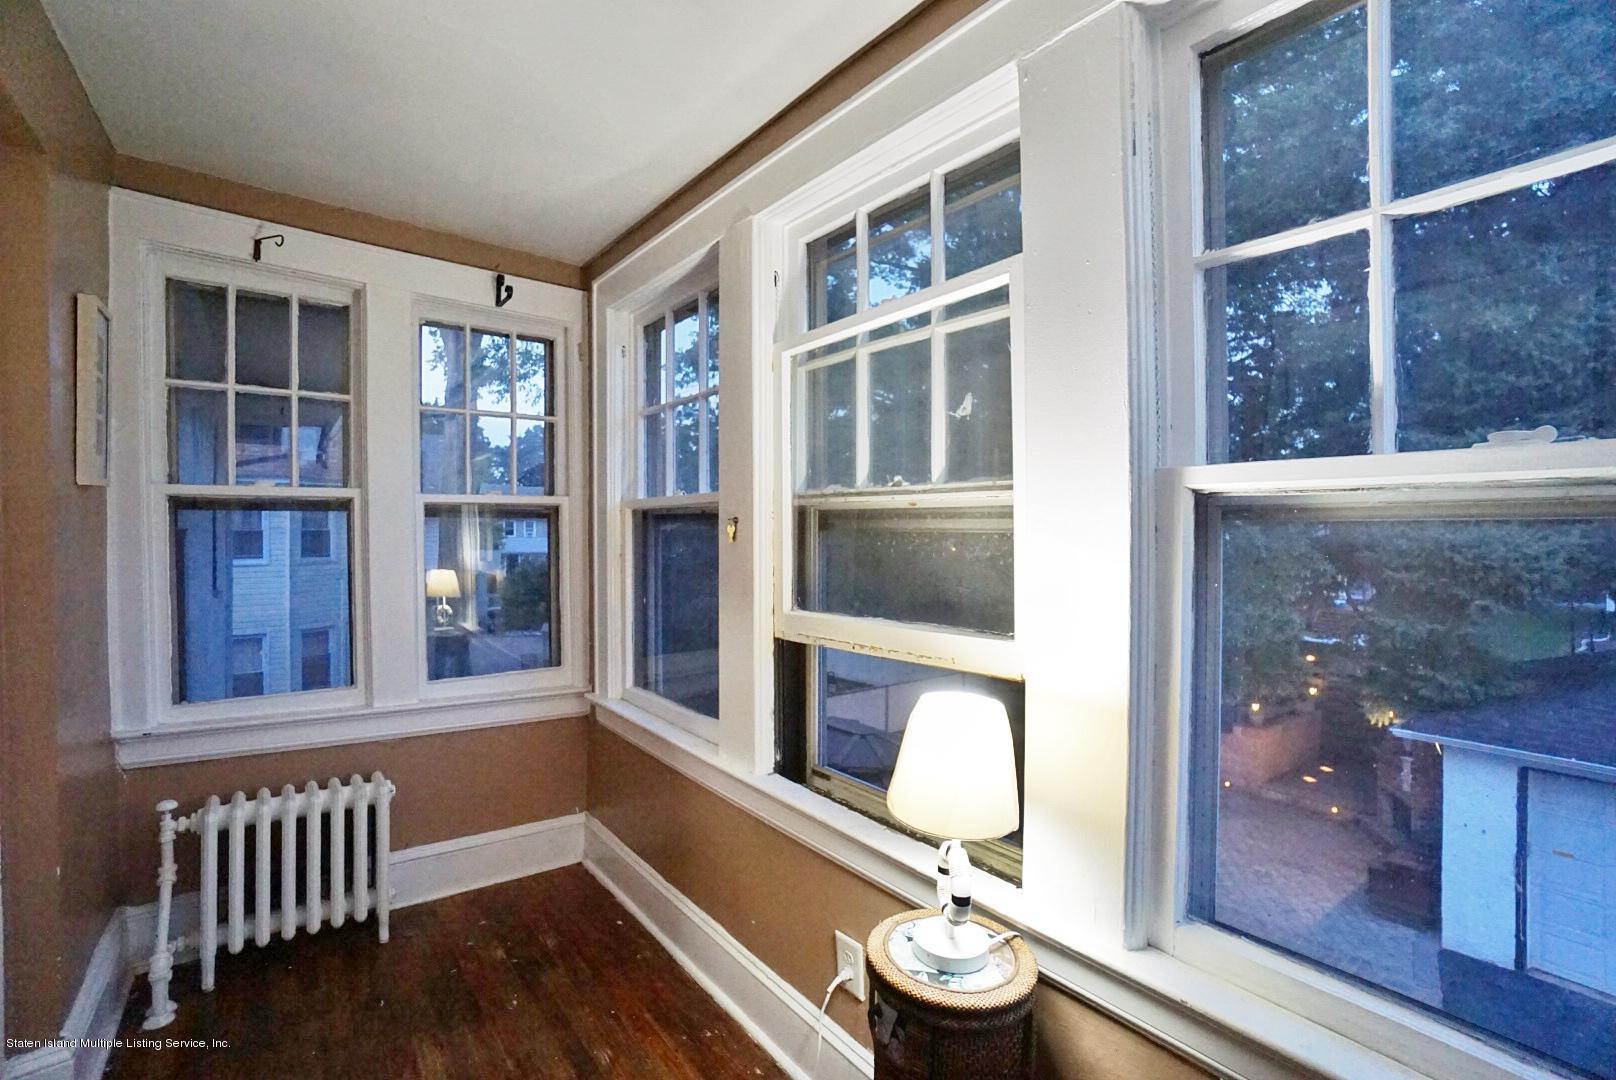 Single Family - Detached 31 Pelton Avenue  Staten Island, NY 10310, MLS-1132177-19